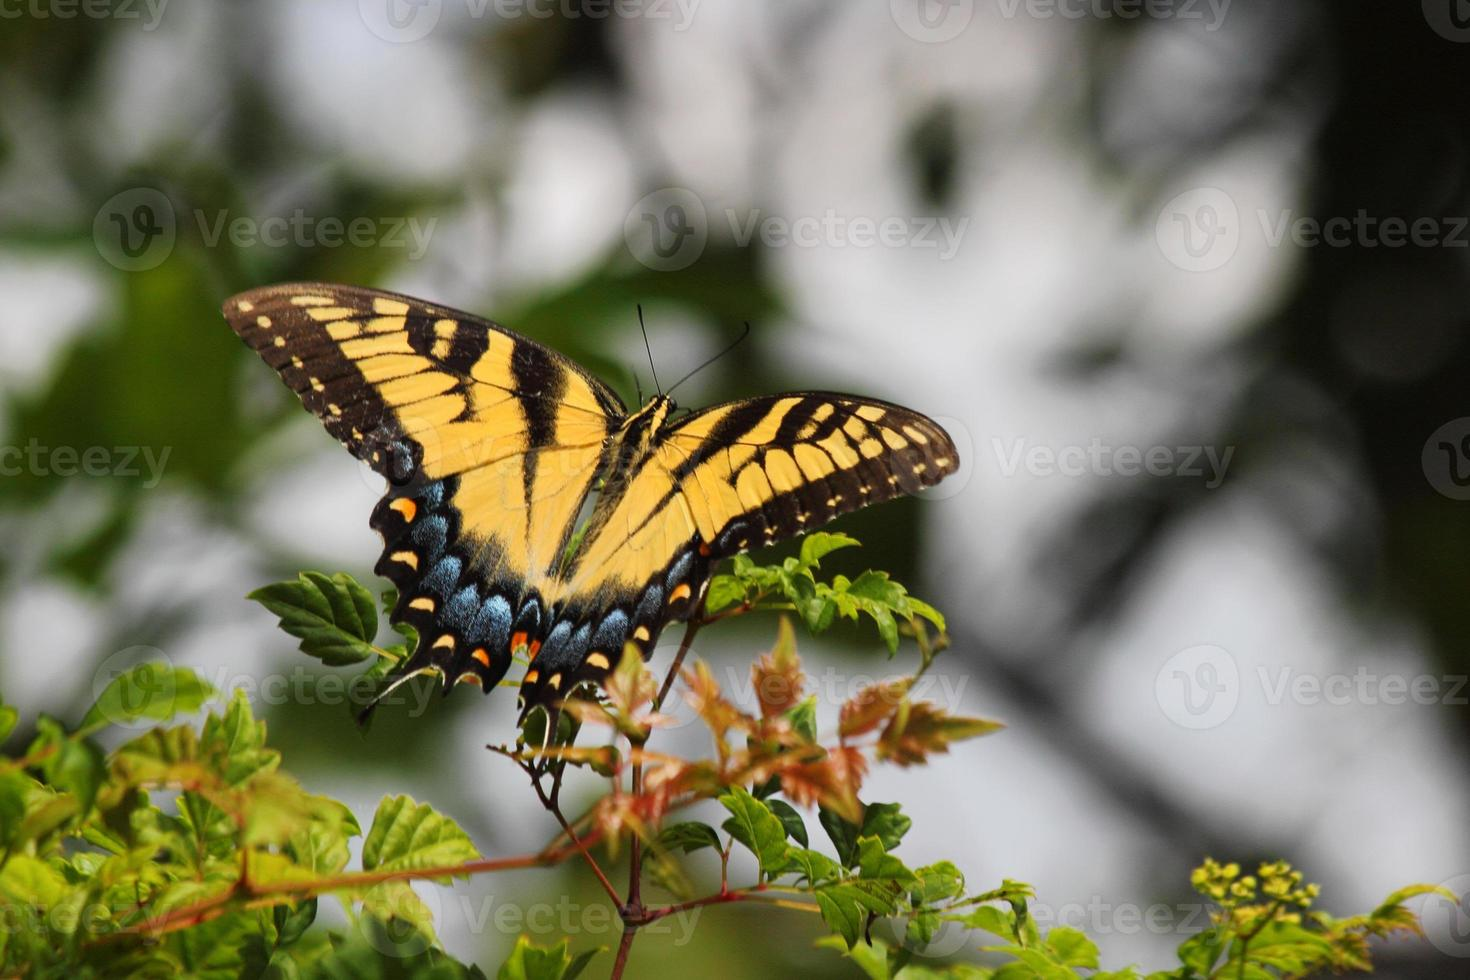 rabo de andorinha tigre oriental feminino (papilio glaucus) foto